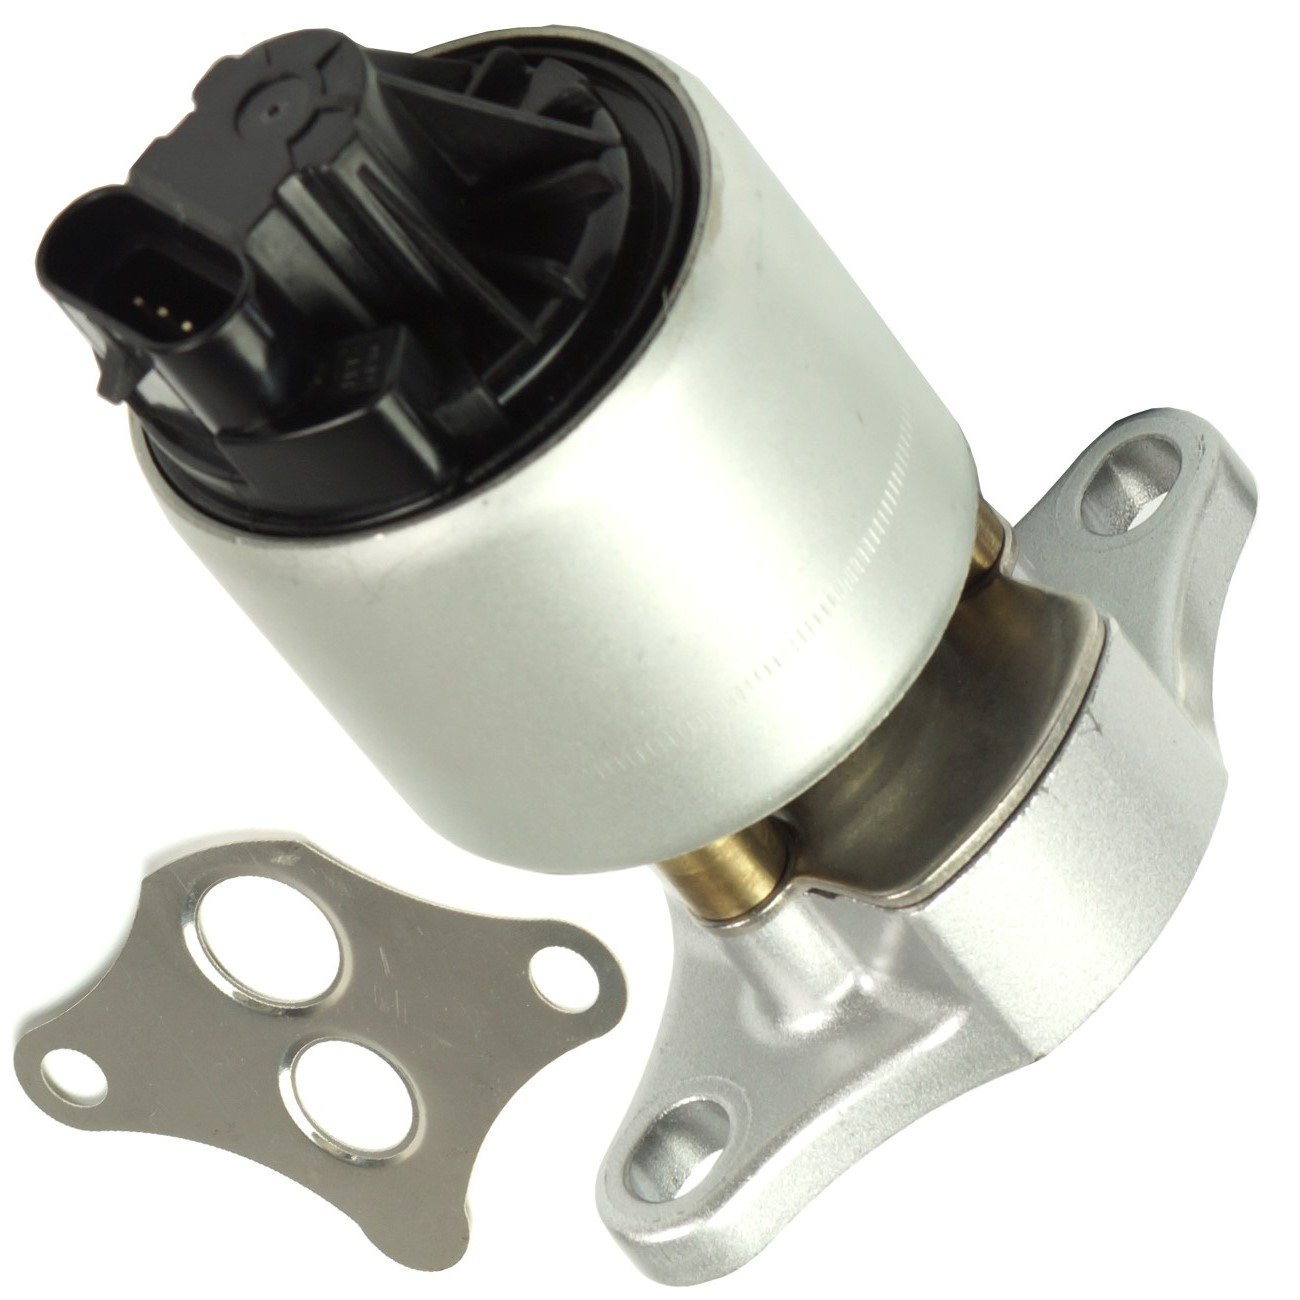 Bapmic 12578040 EGR Exhaust Gas Recirculation Valve for Cadillac Chevrolet GMC Oldsmobile